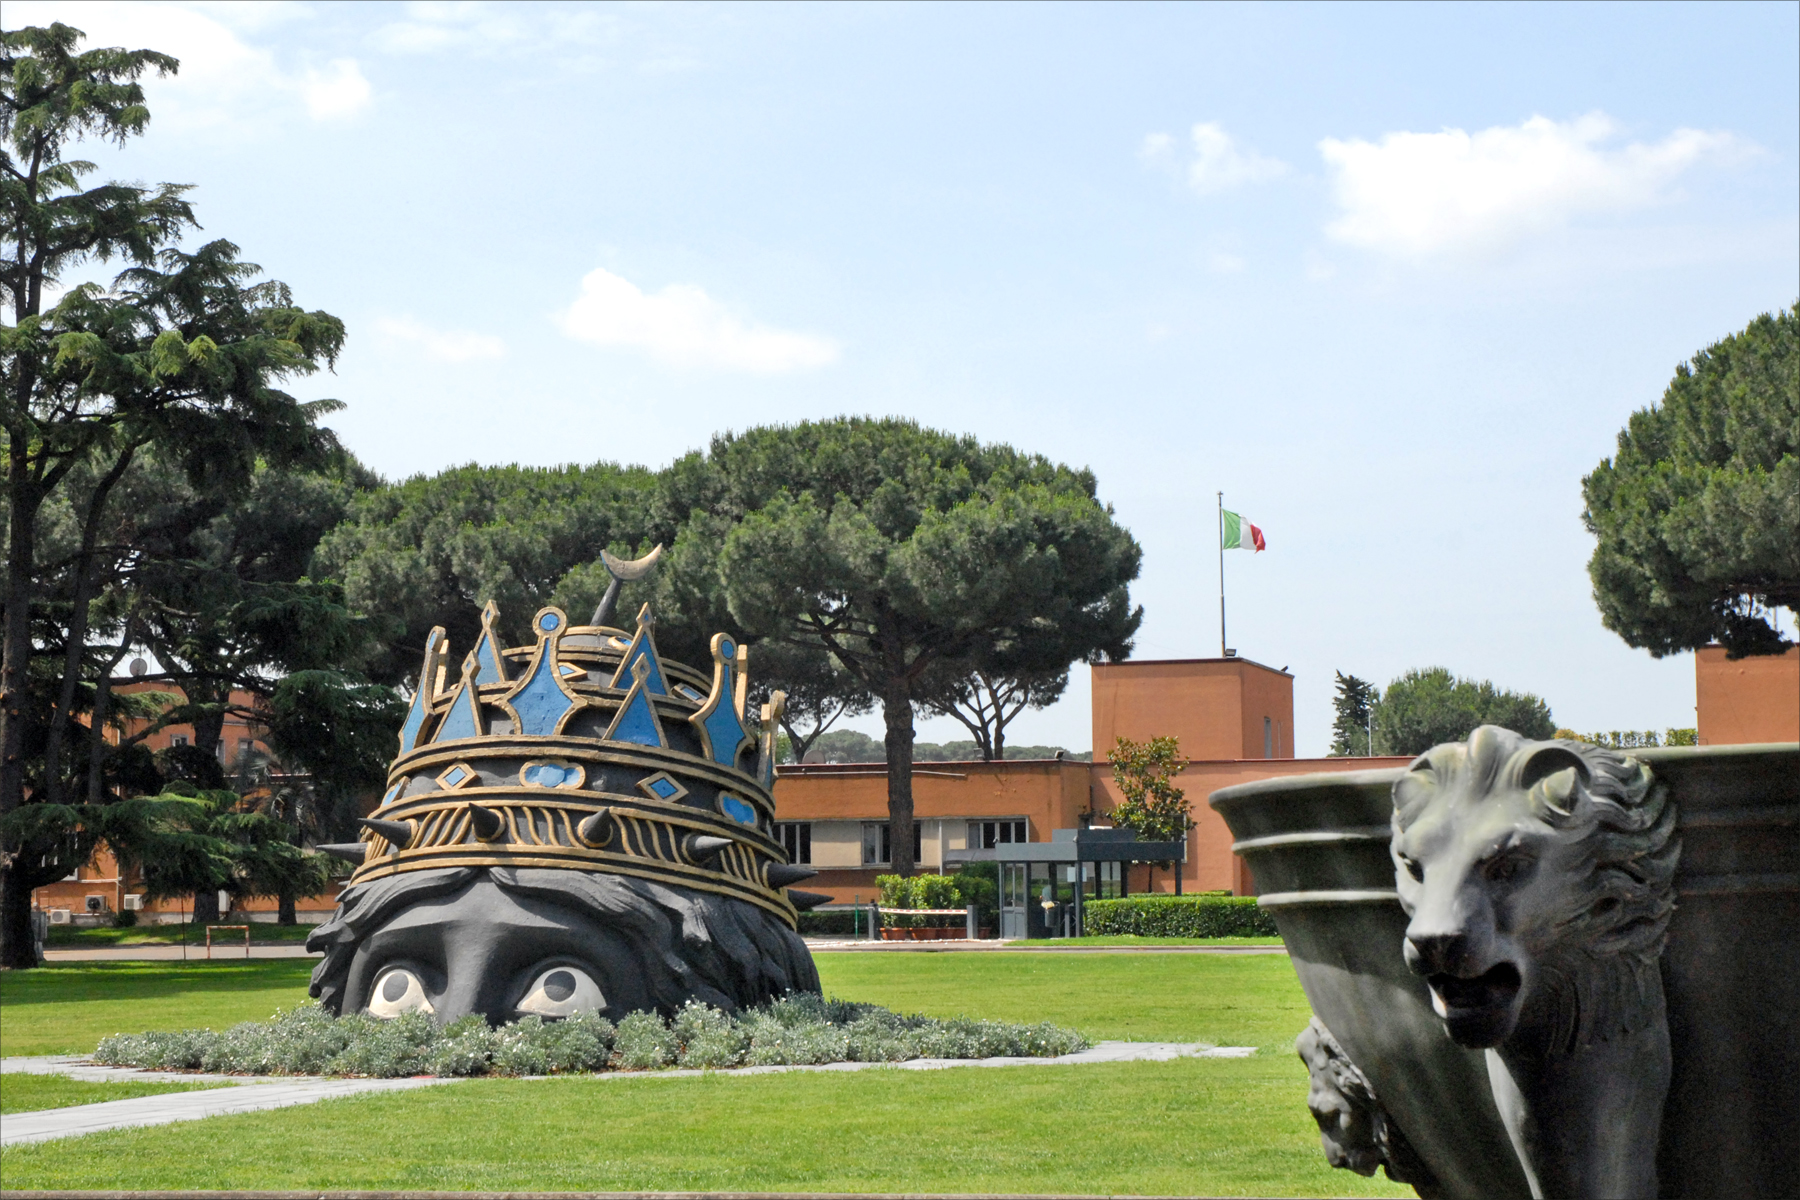 File:Cinecittà ouvre ses portes (Rome) (5856188558).jpg - Wikimedia Commons